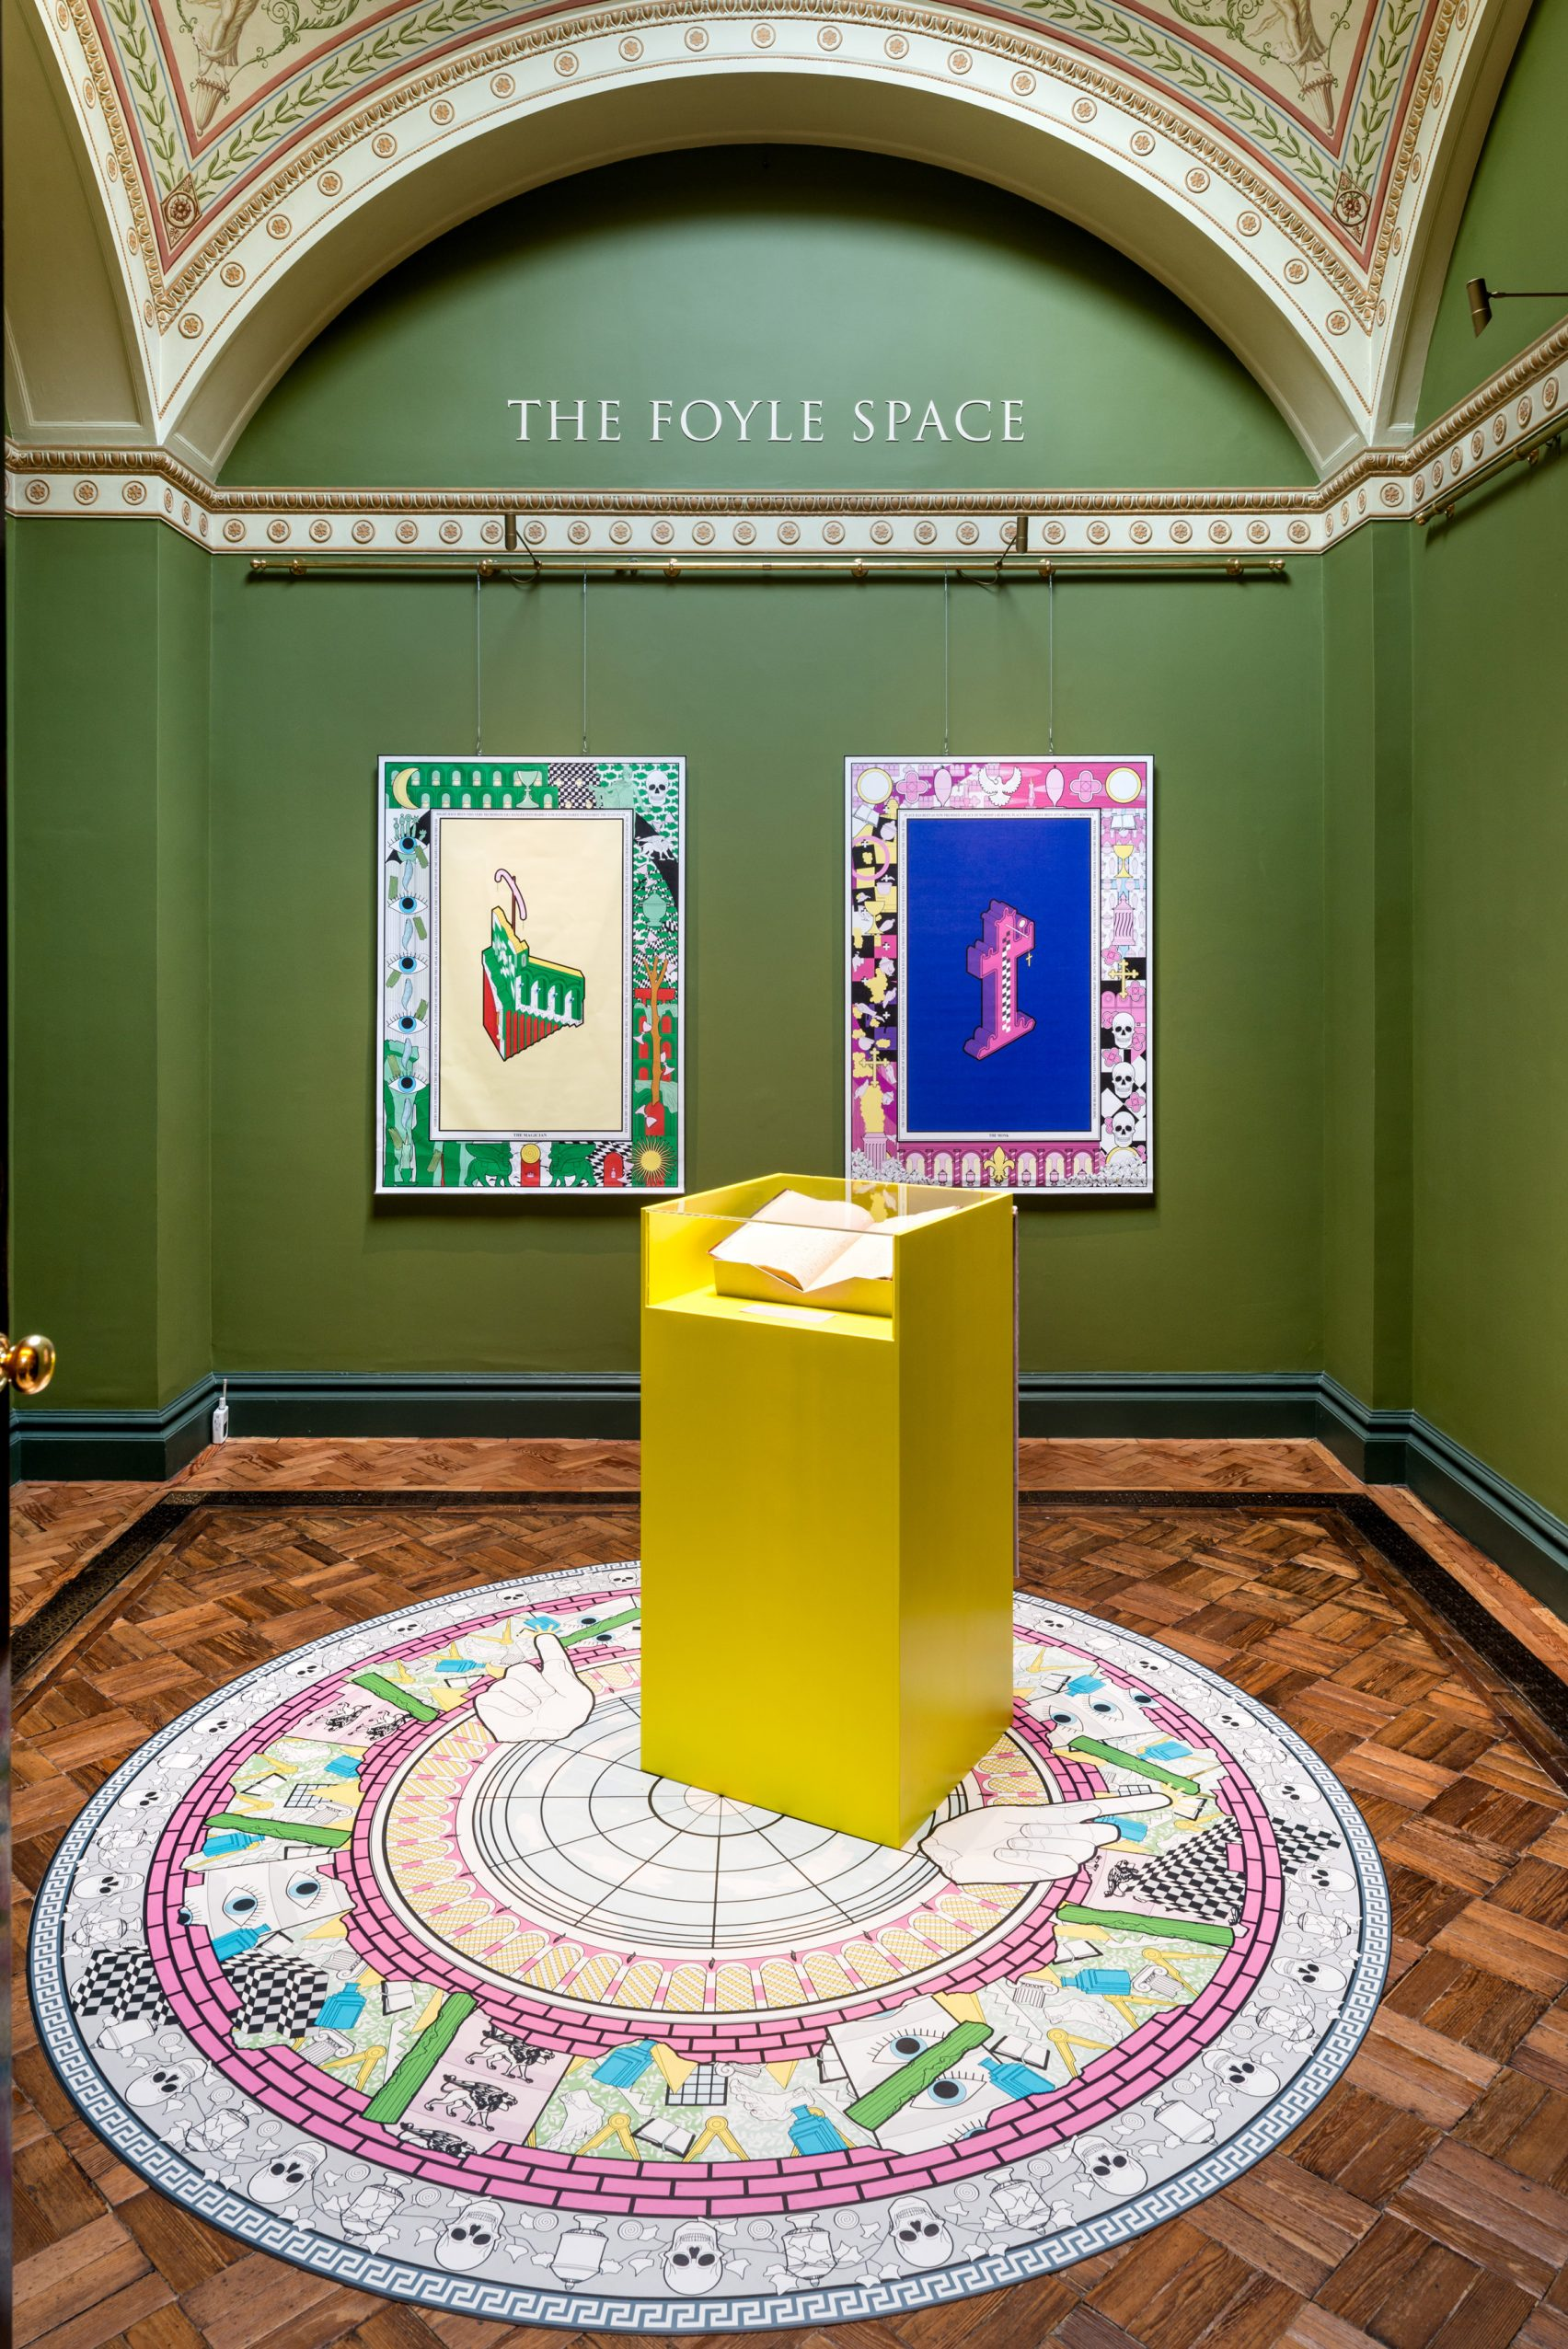 john-soane-architectural-characters-installation-london-uk_dezeen_2364_col_9-1704x2553.jpg